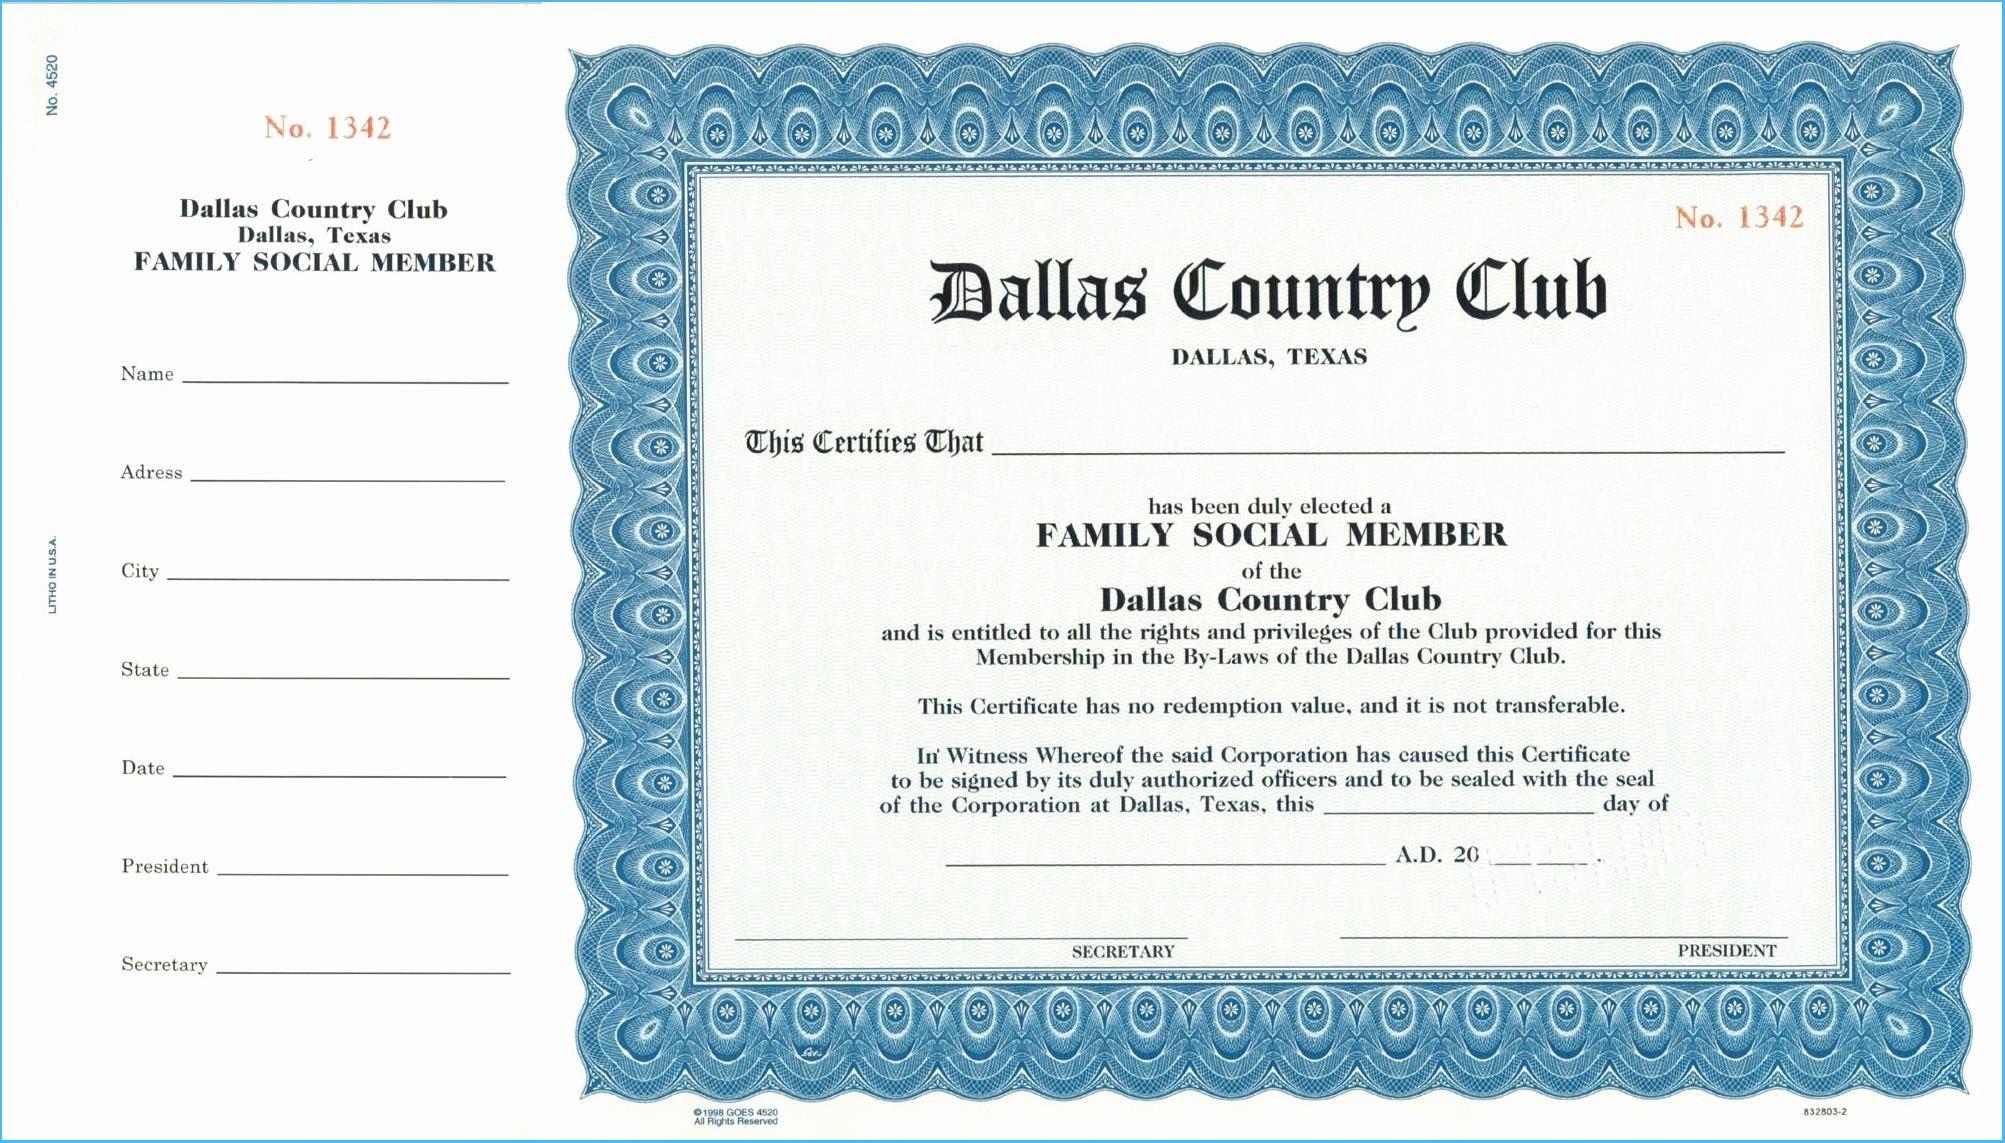 Llc Membership Certificate Template Within Llc Membership Certificate Template